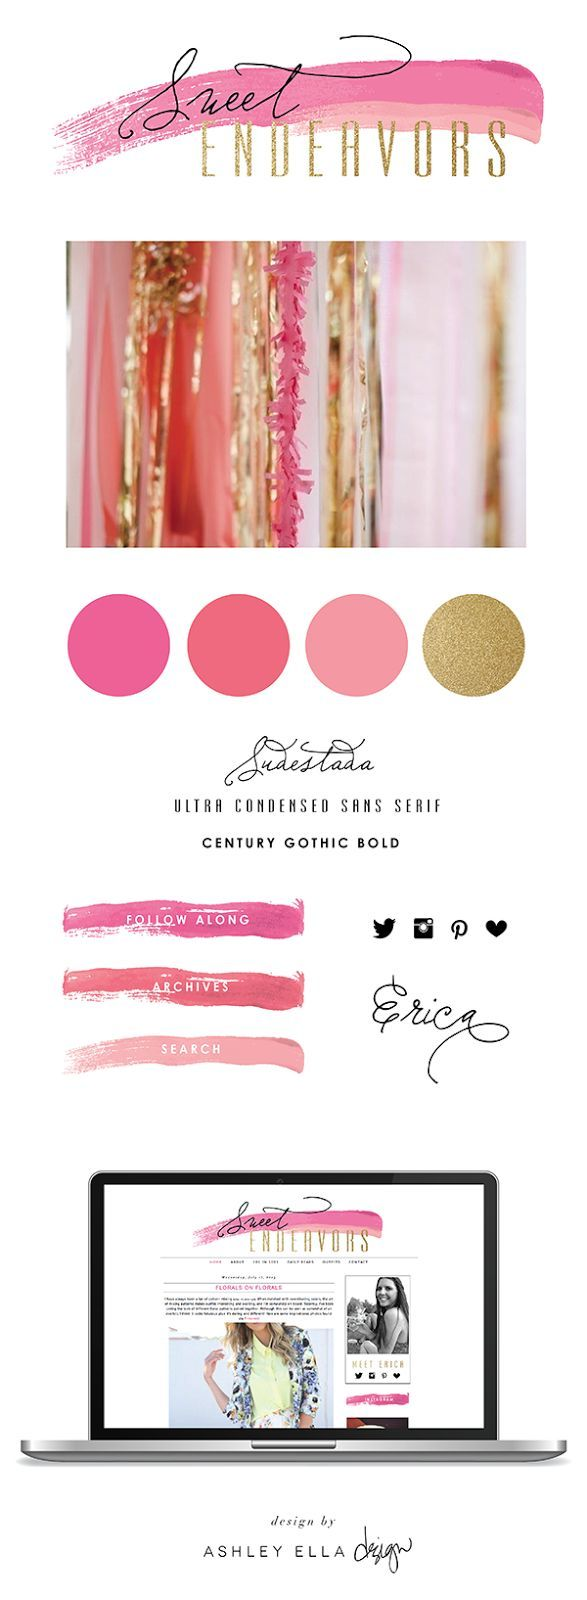 Blog branding by Ashley Ella Design